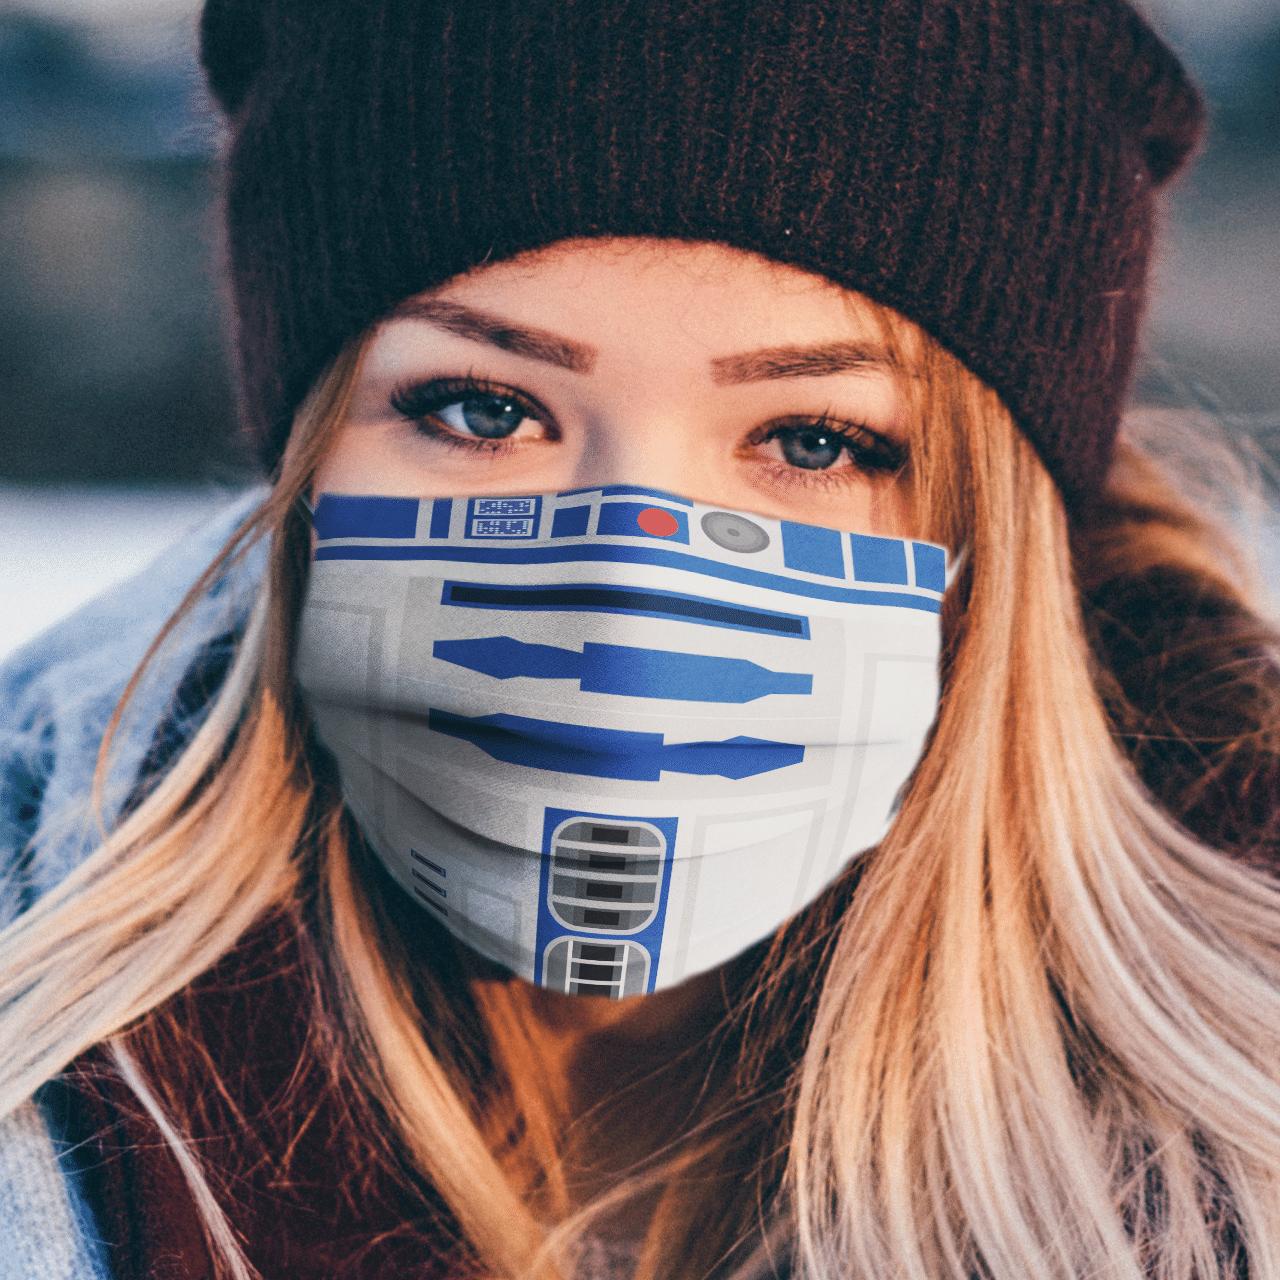 Star Wars R2-D2 Full Printed face mask